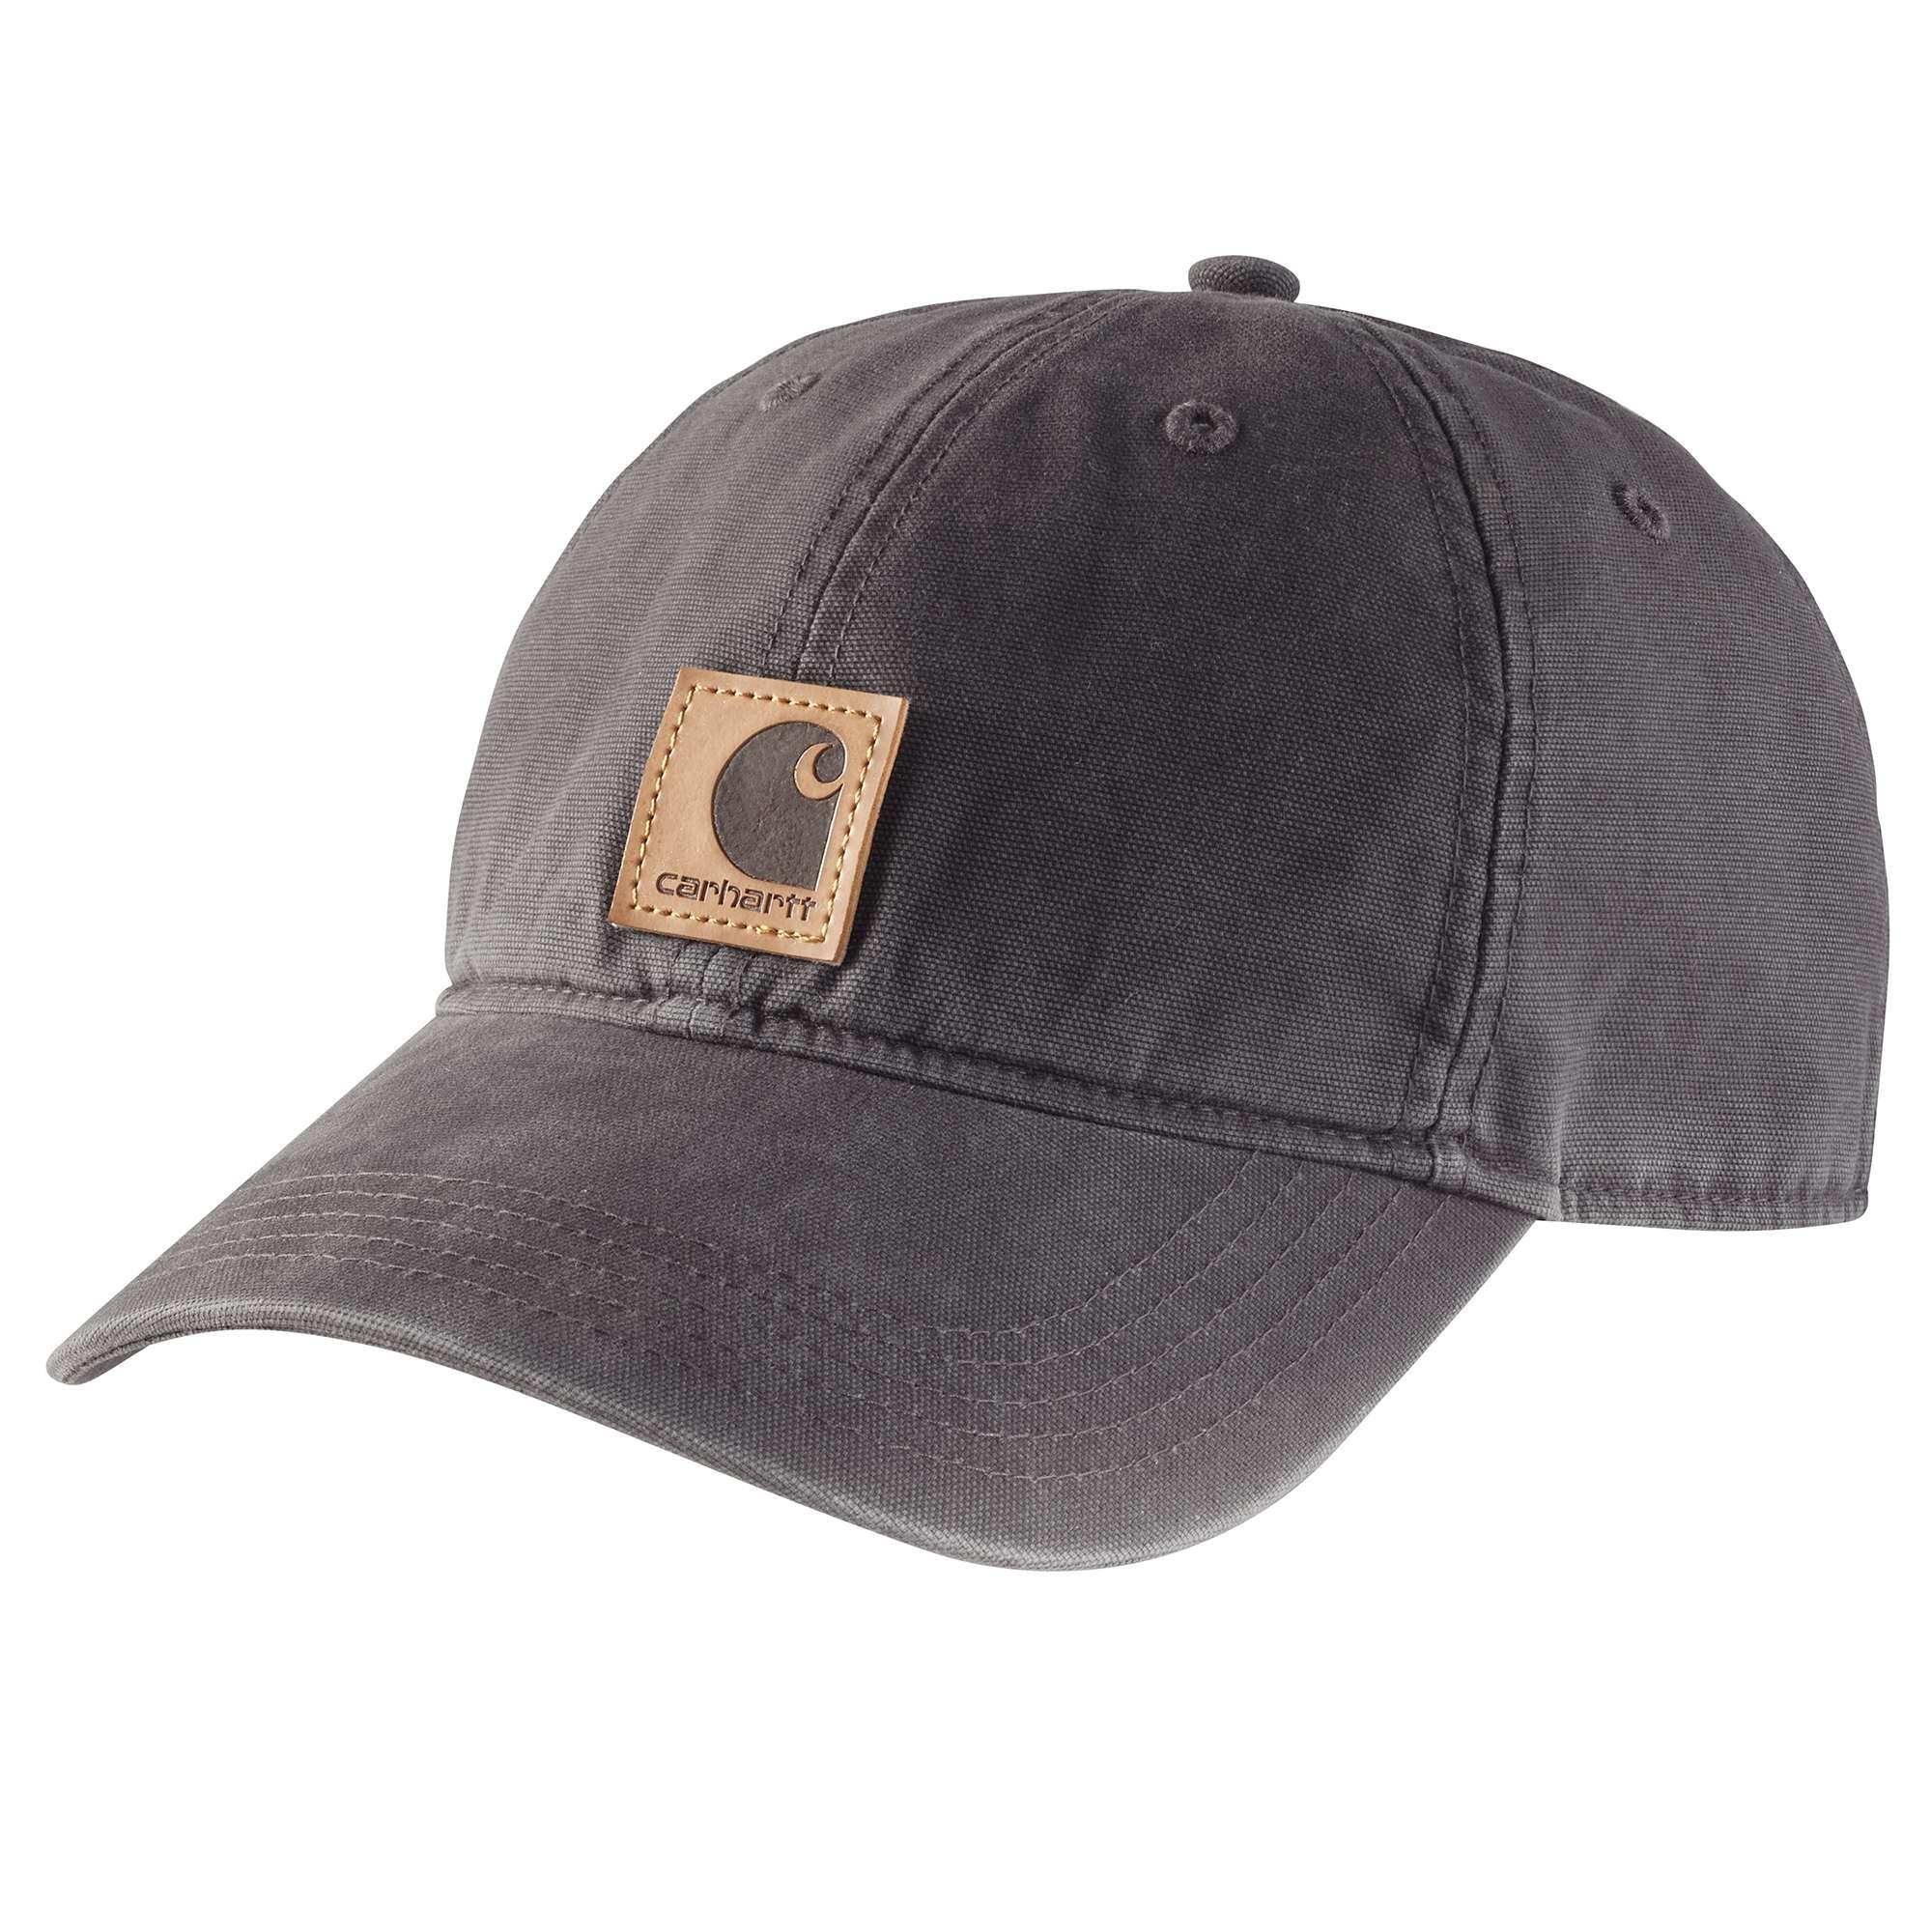 Odessa Cap, Black, swatch